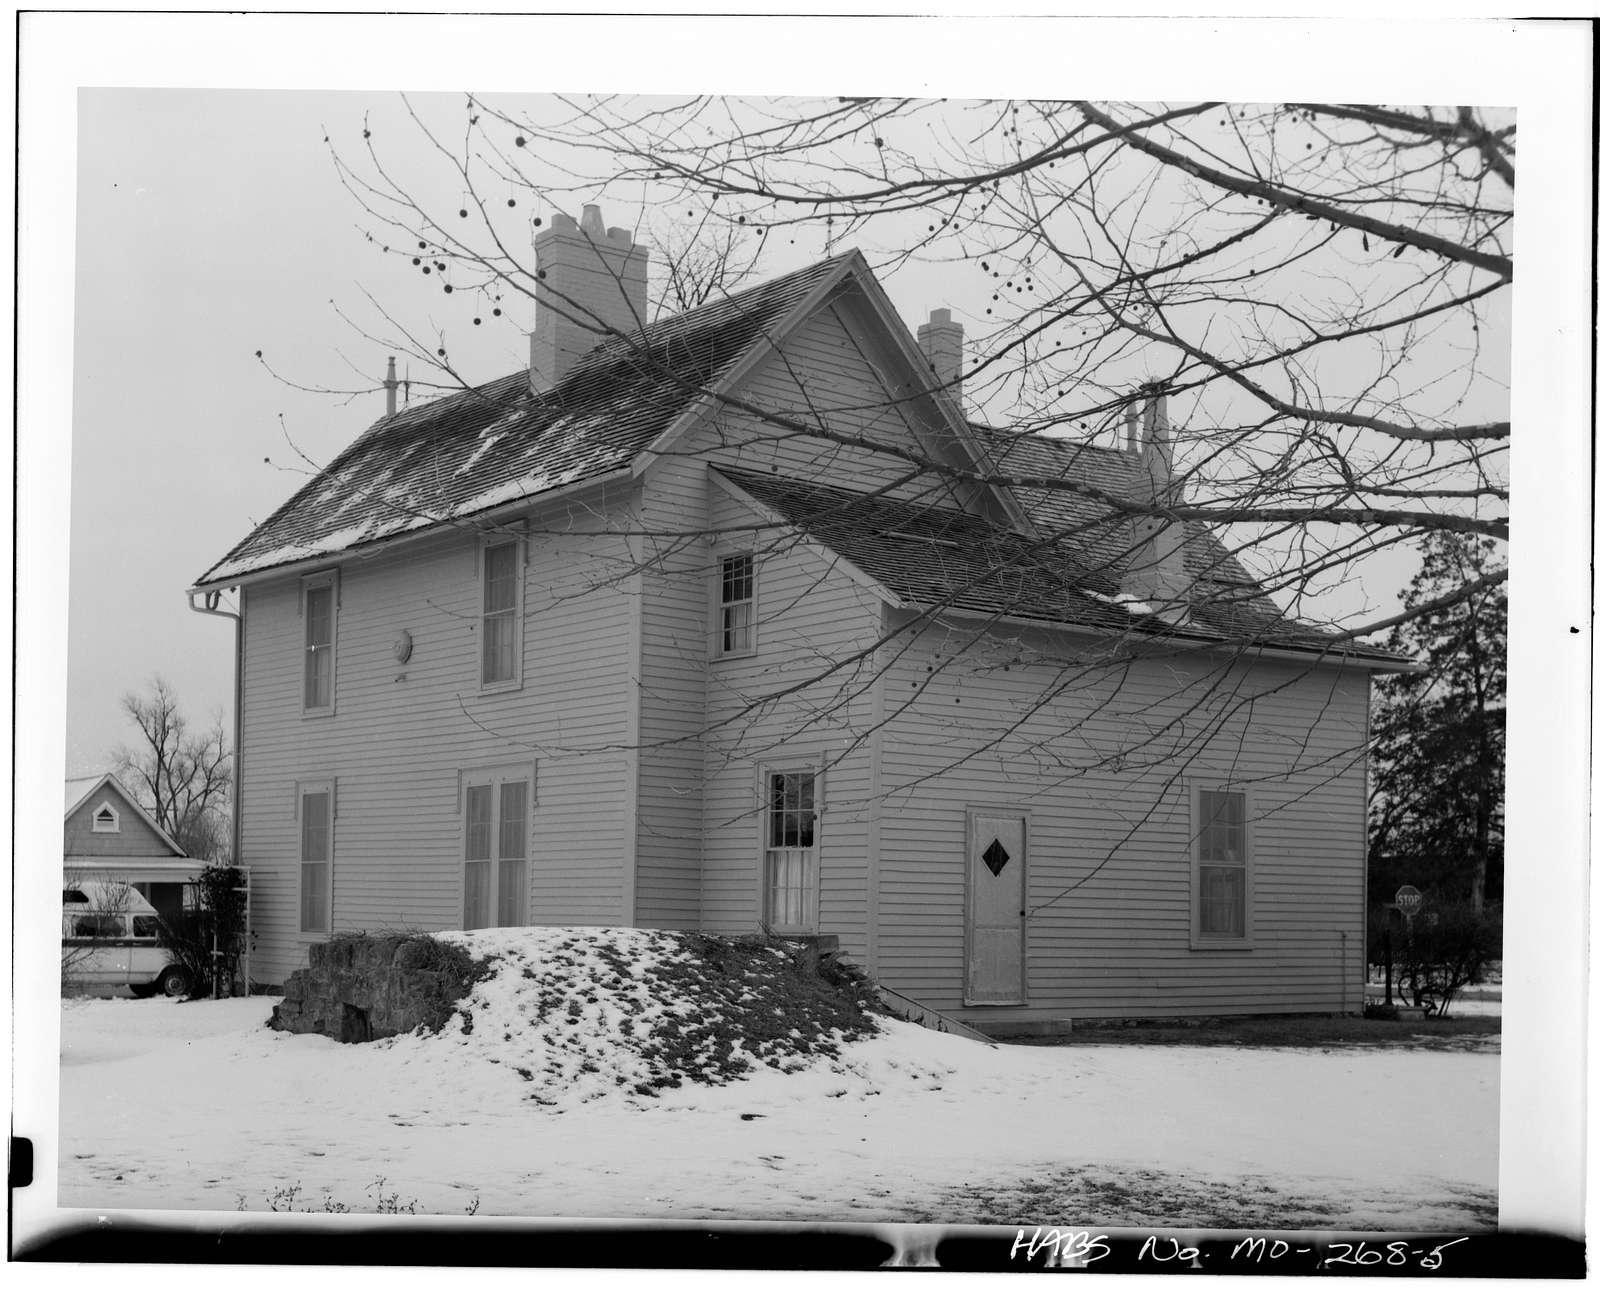 General John J. Pershing Boyhood Home, State & Worlow Streets, Laclede, Linn County, MO